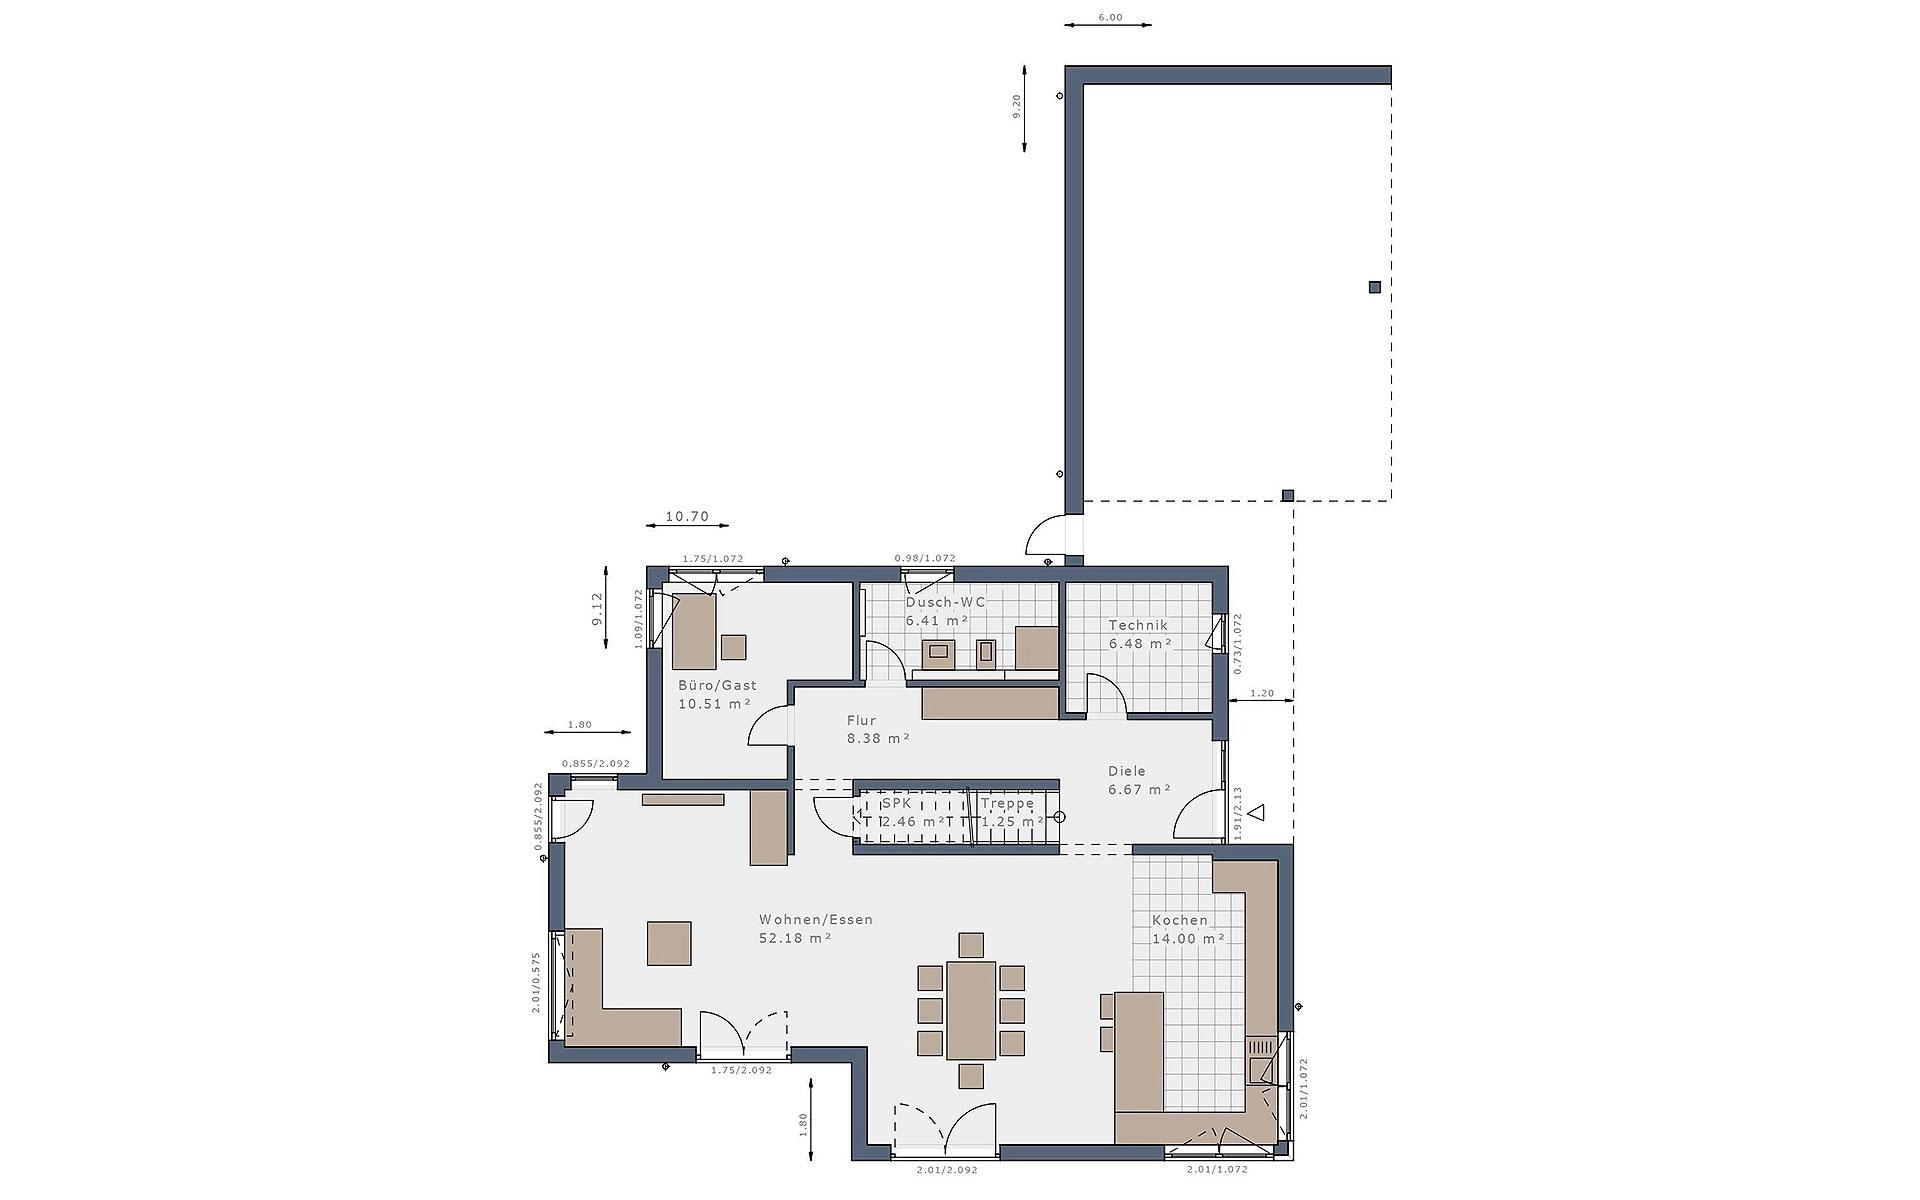 Erdgeschoss Solitaire-E-165 E9 von Schwabenhaus GmbH & Co. KG